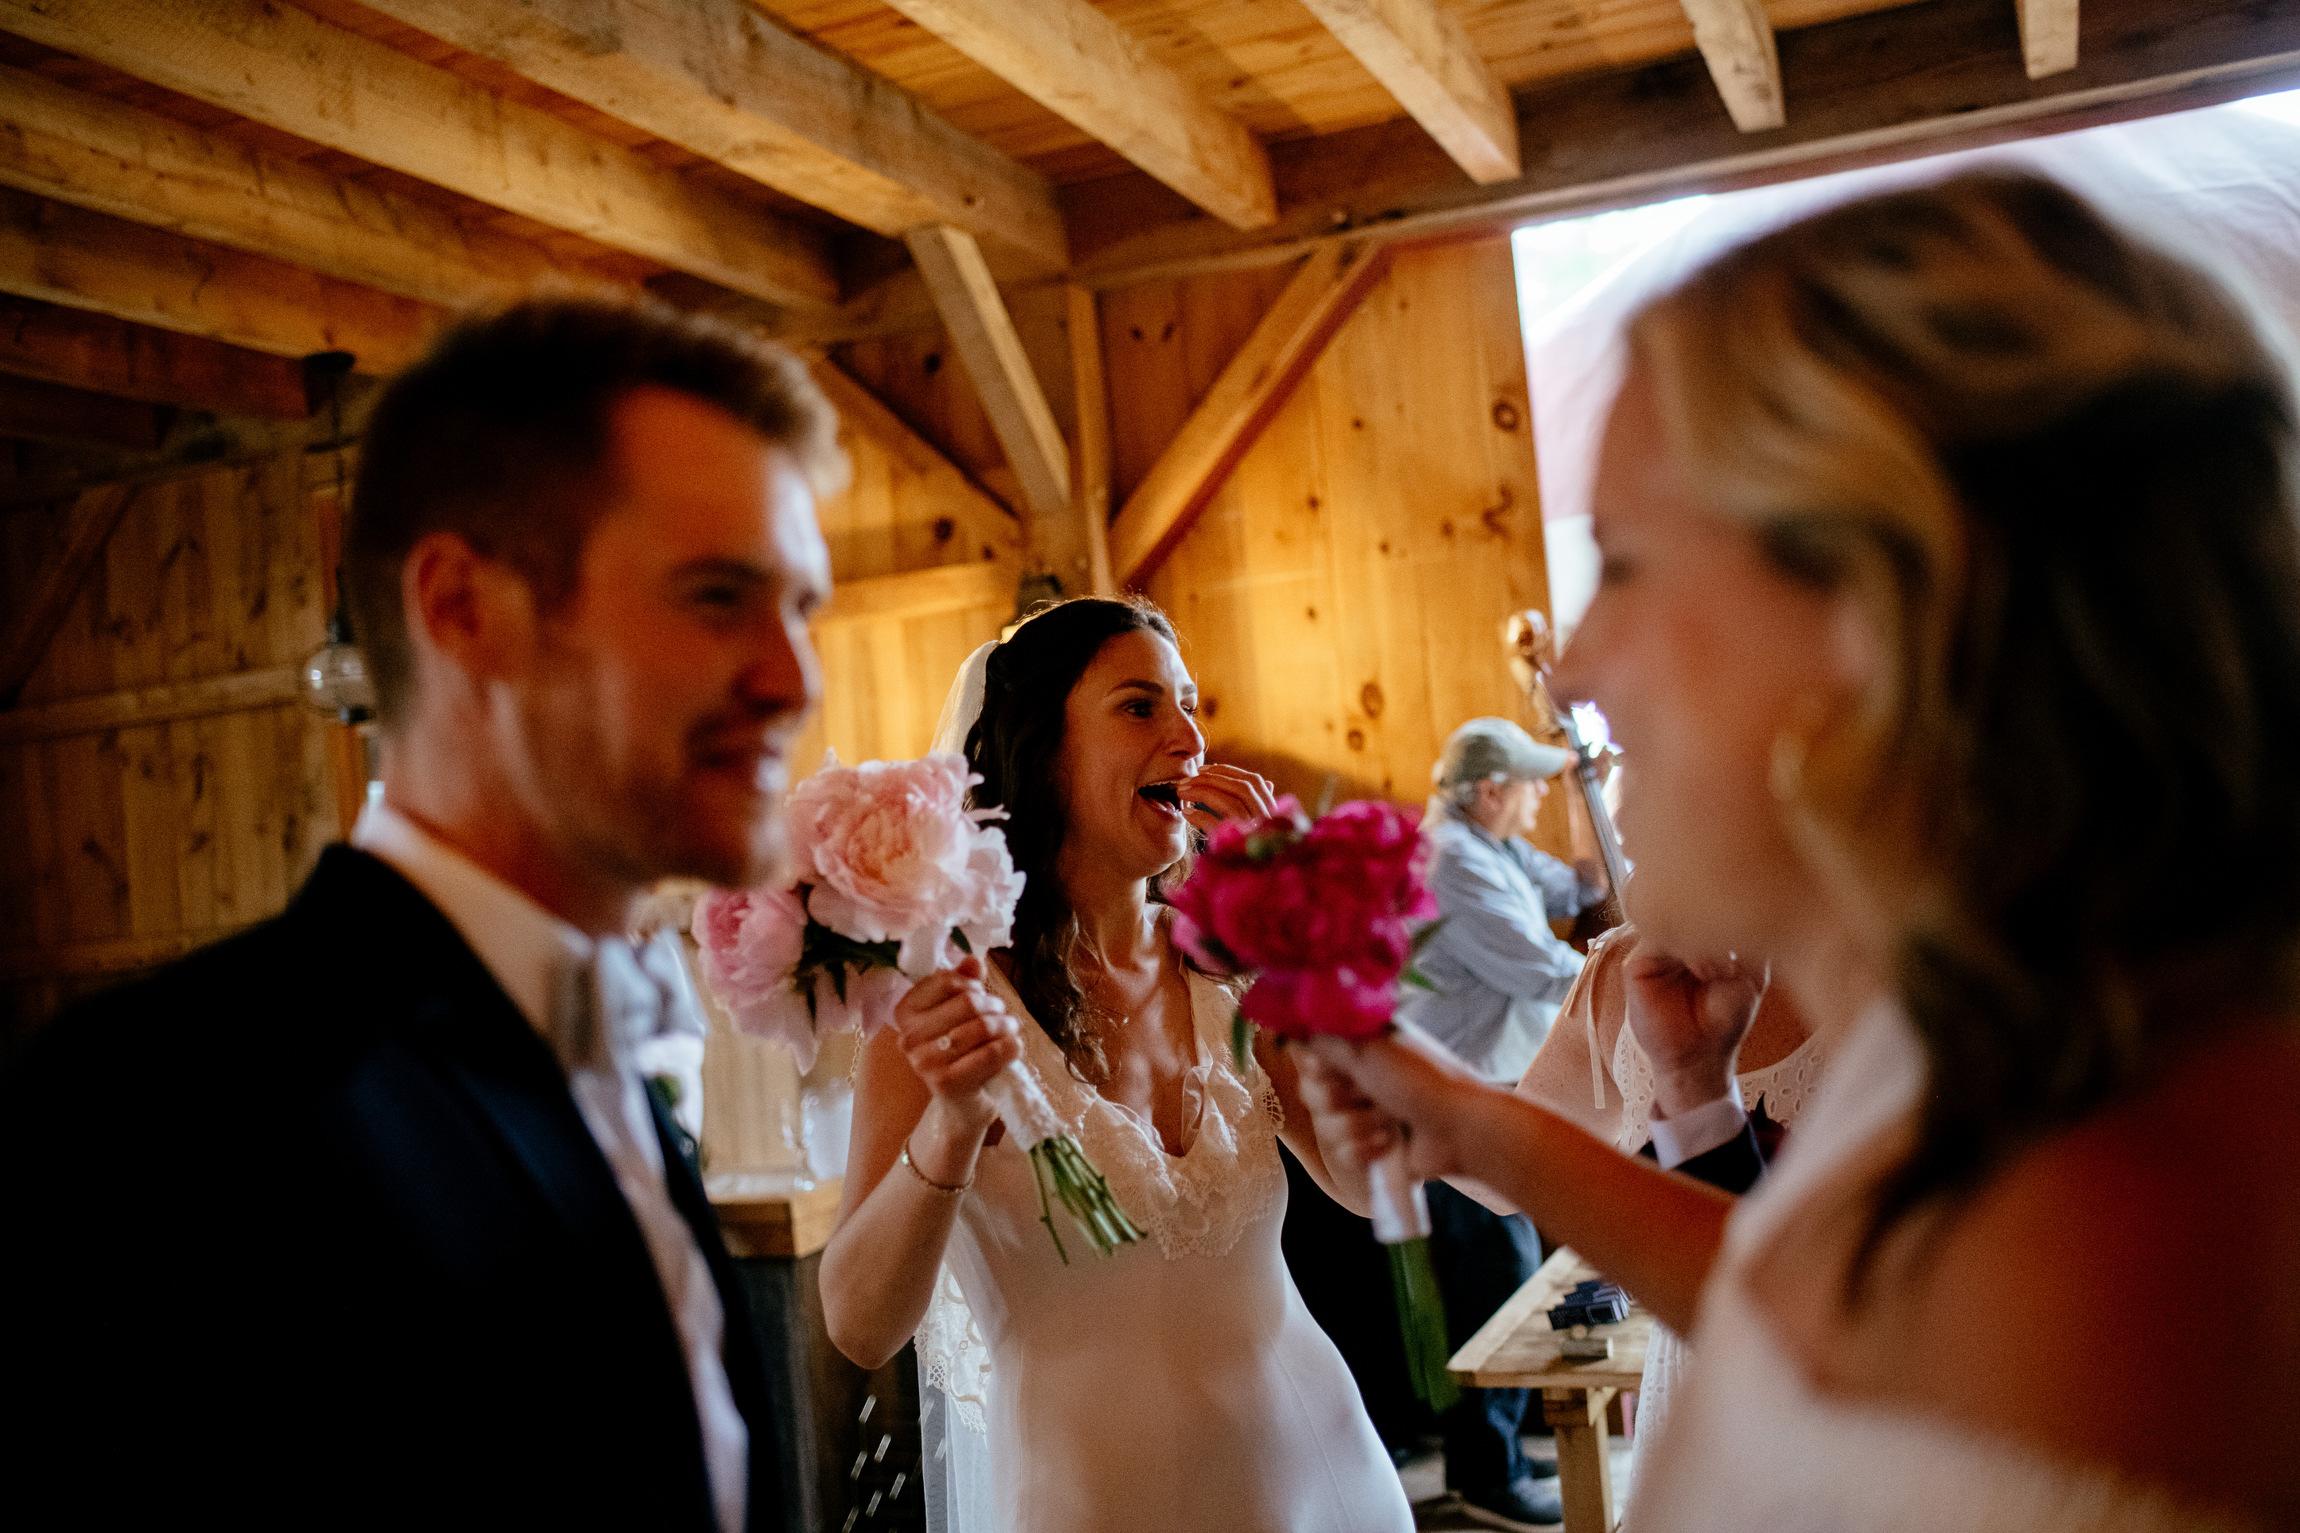 vermont_farm_wedding_photos_mikhail_glabetS_30.JPG